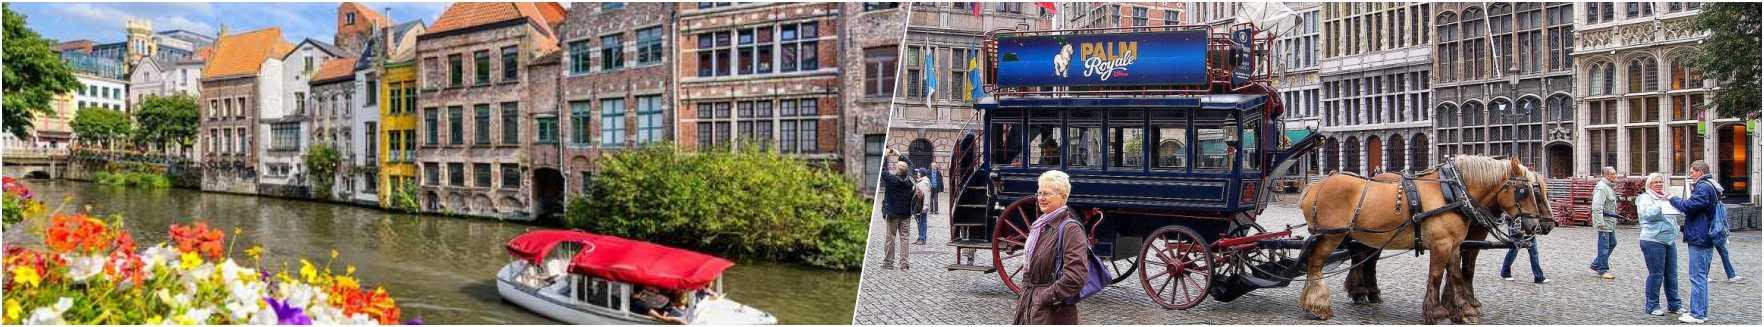 Ghent - Antwerp